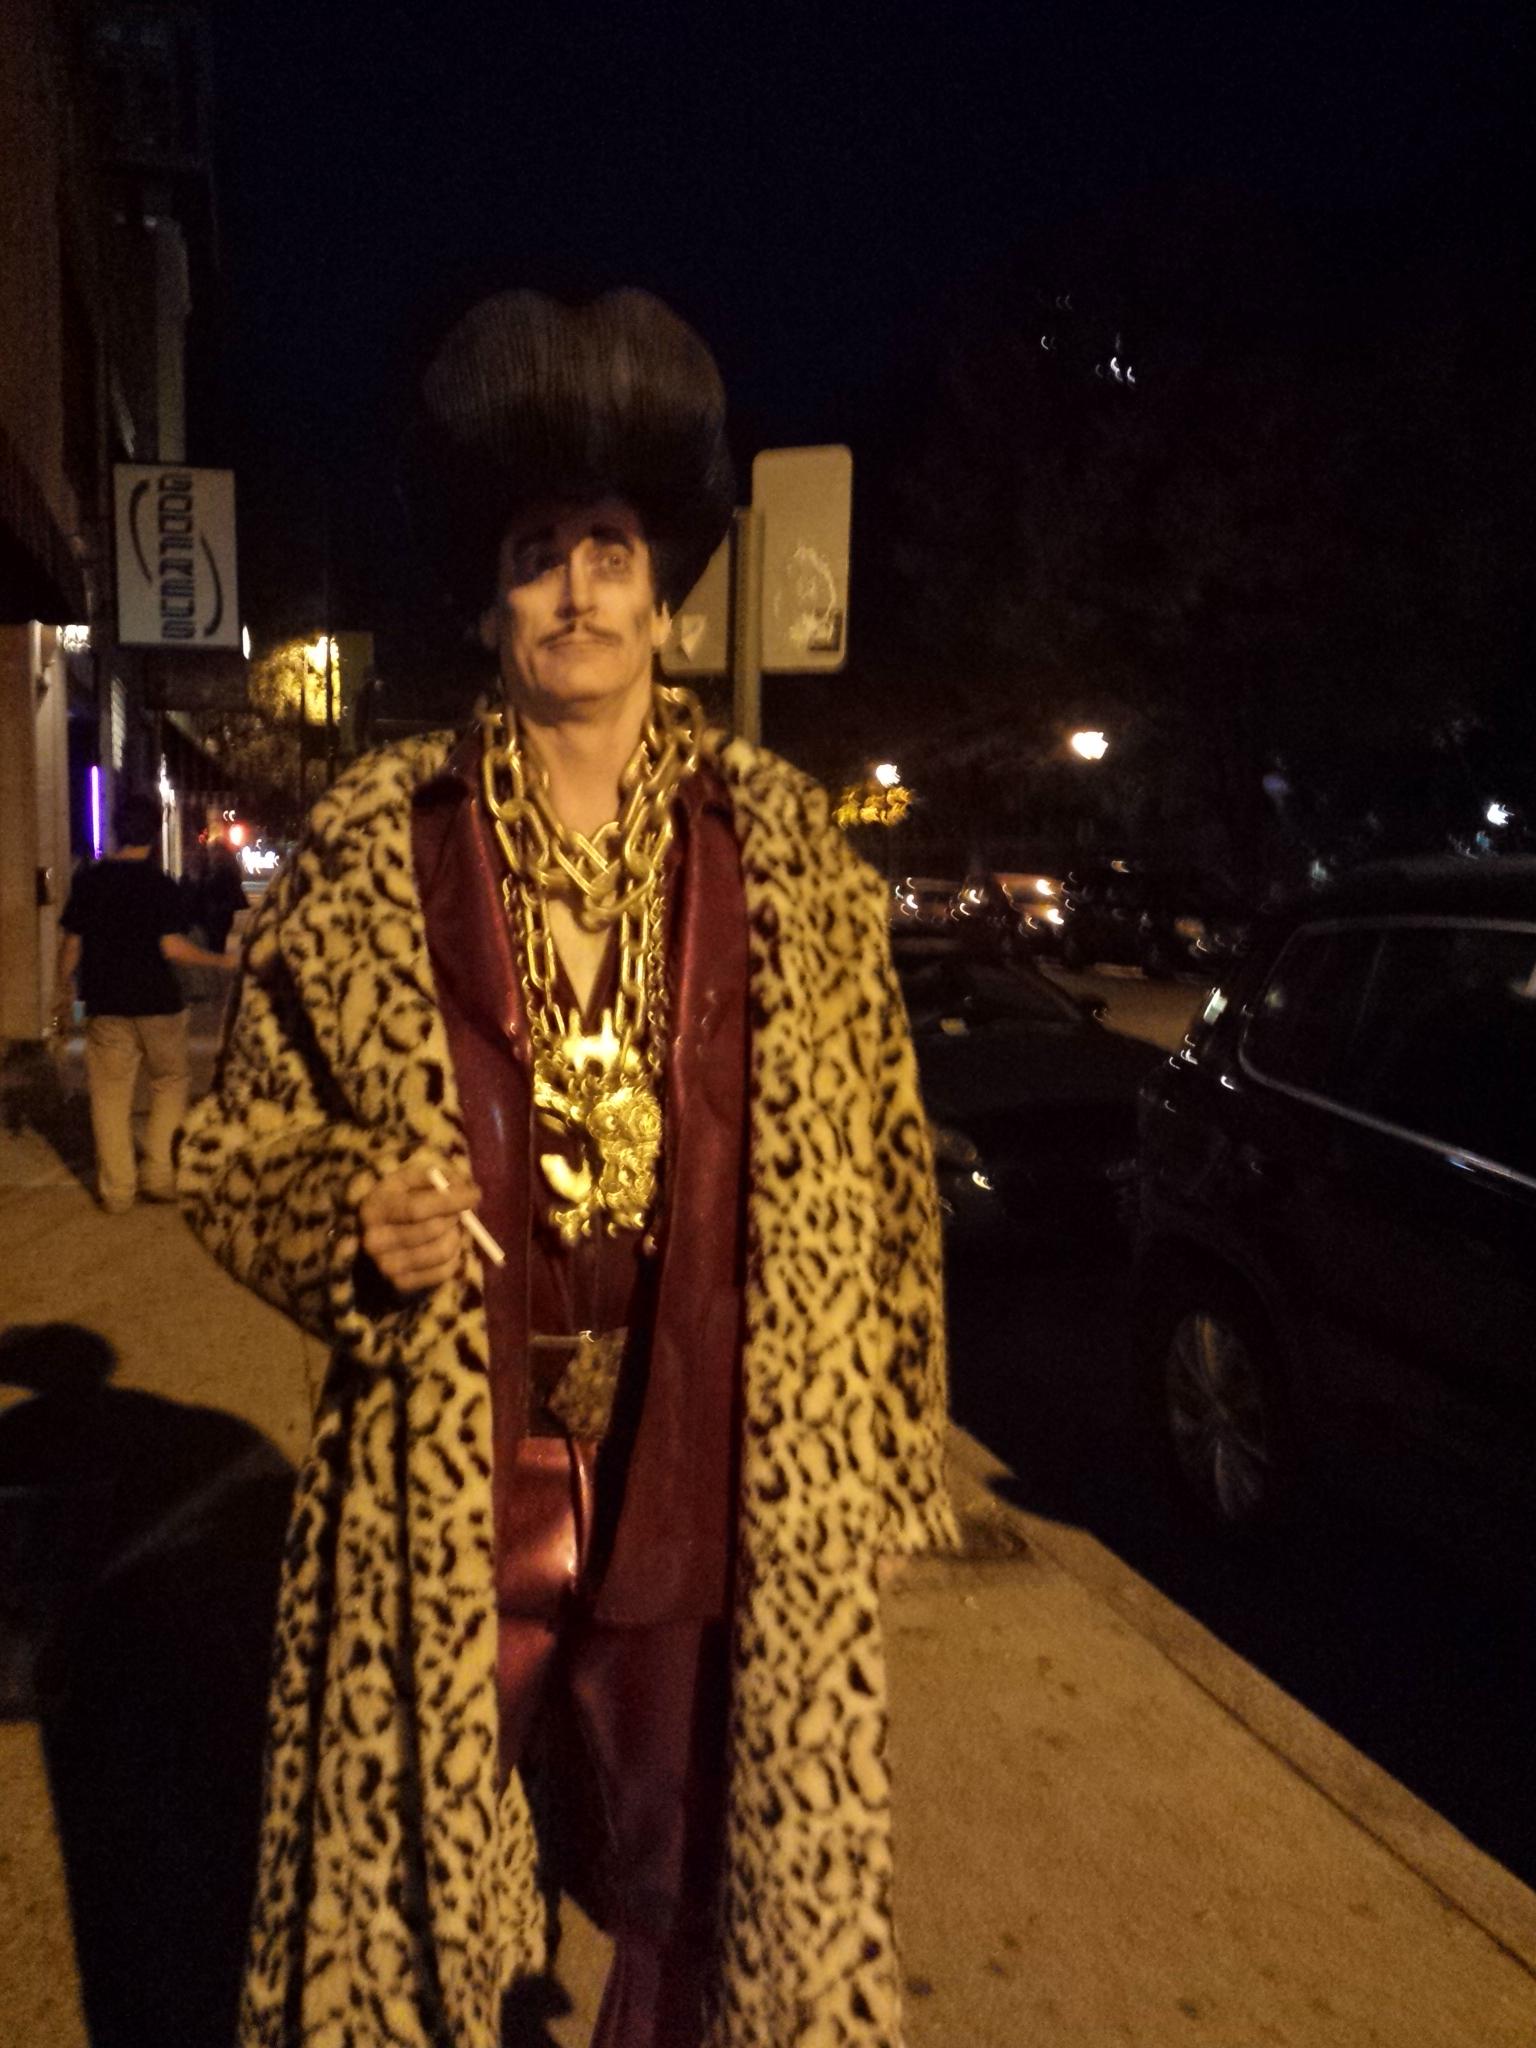 Sleazy p martini costume